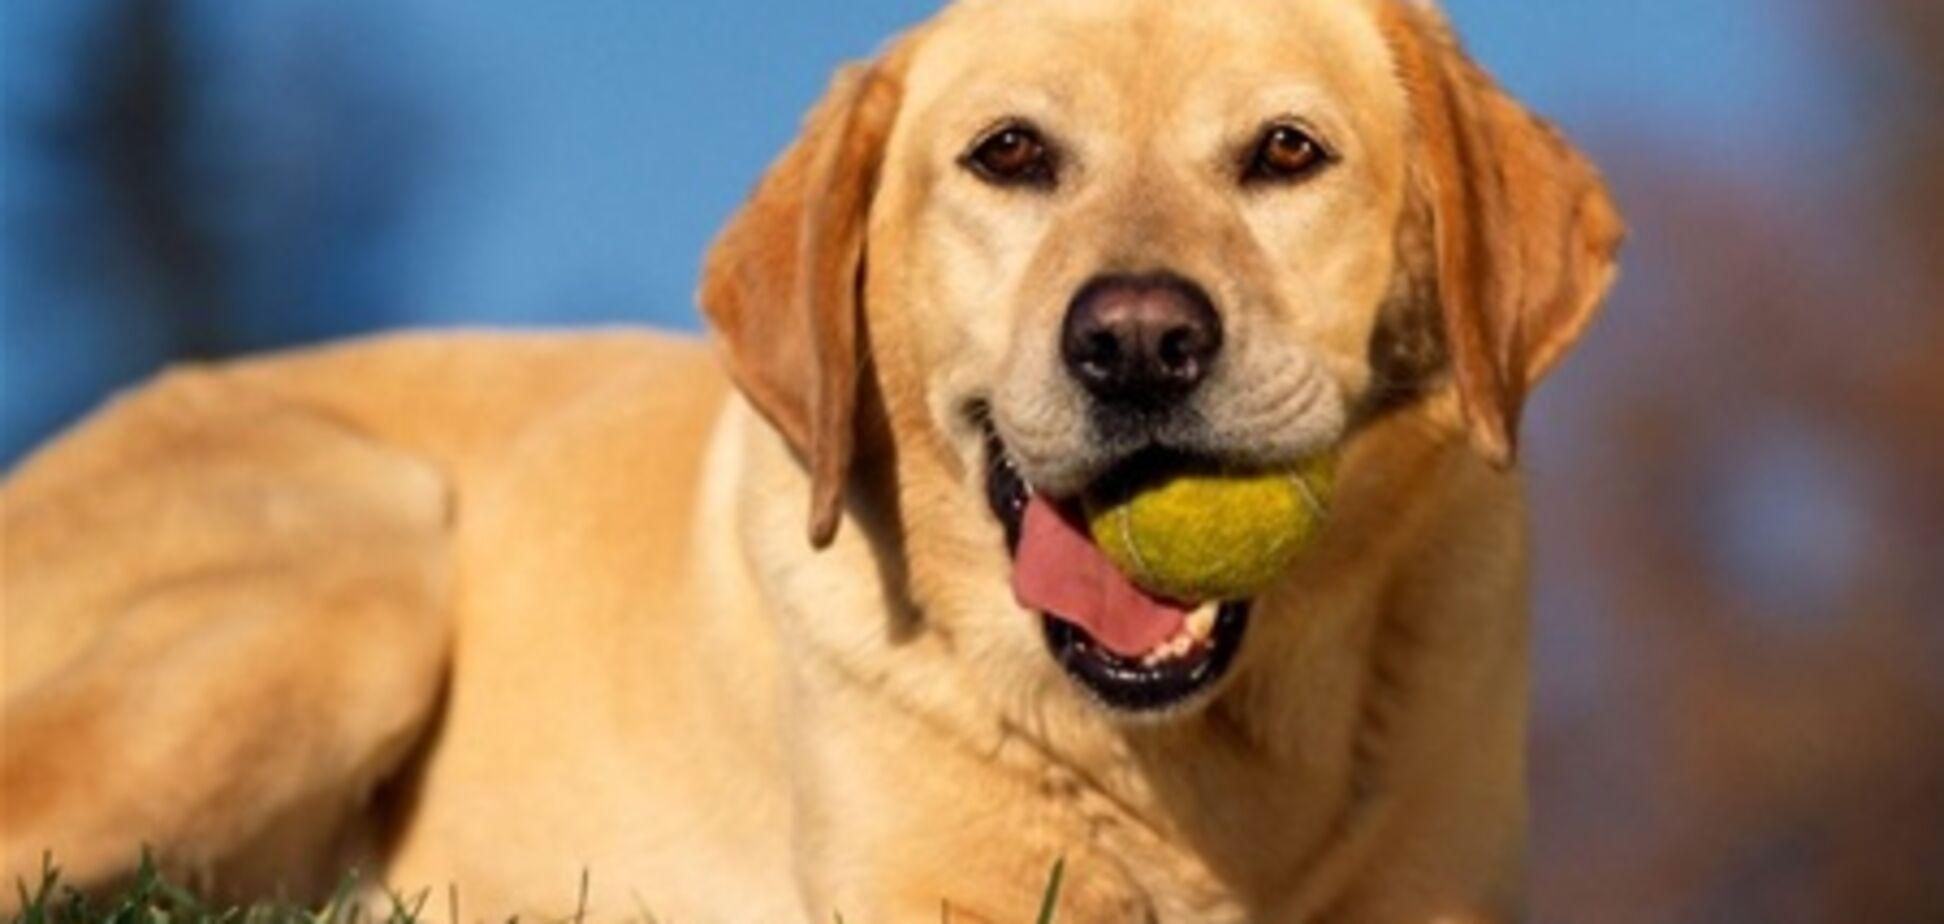 Херсонским собакам запретят лаять с 22.00 до 06.00